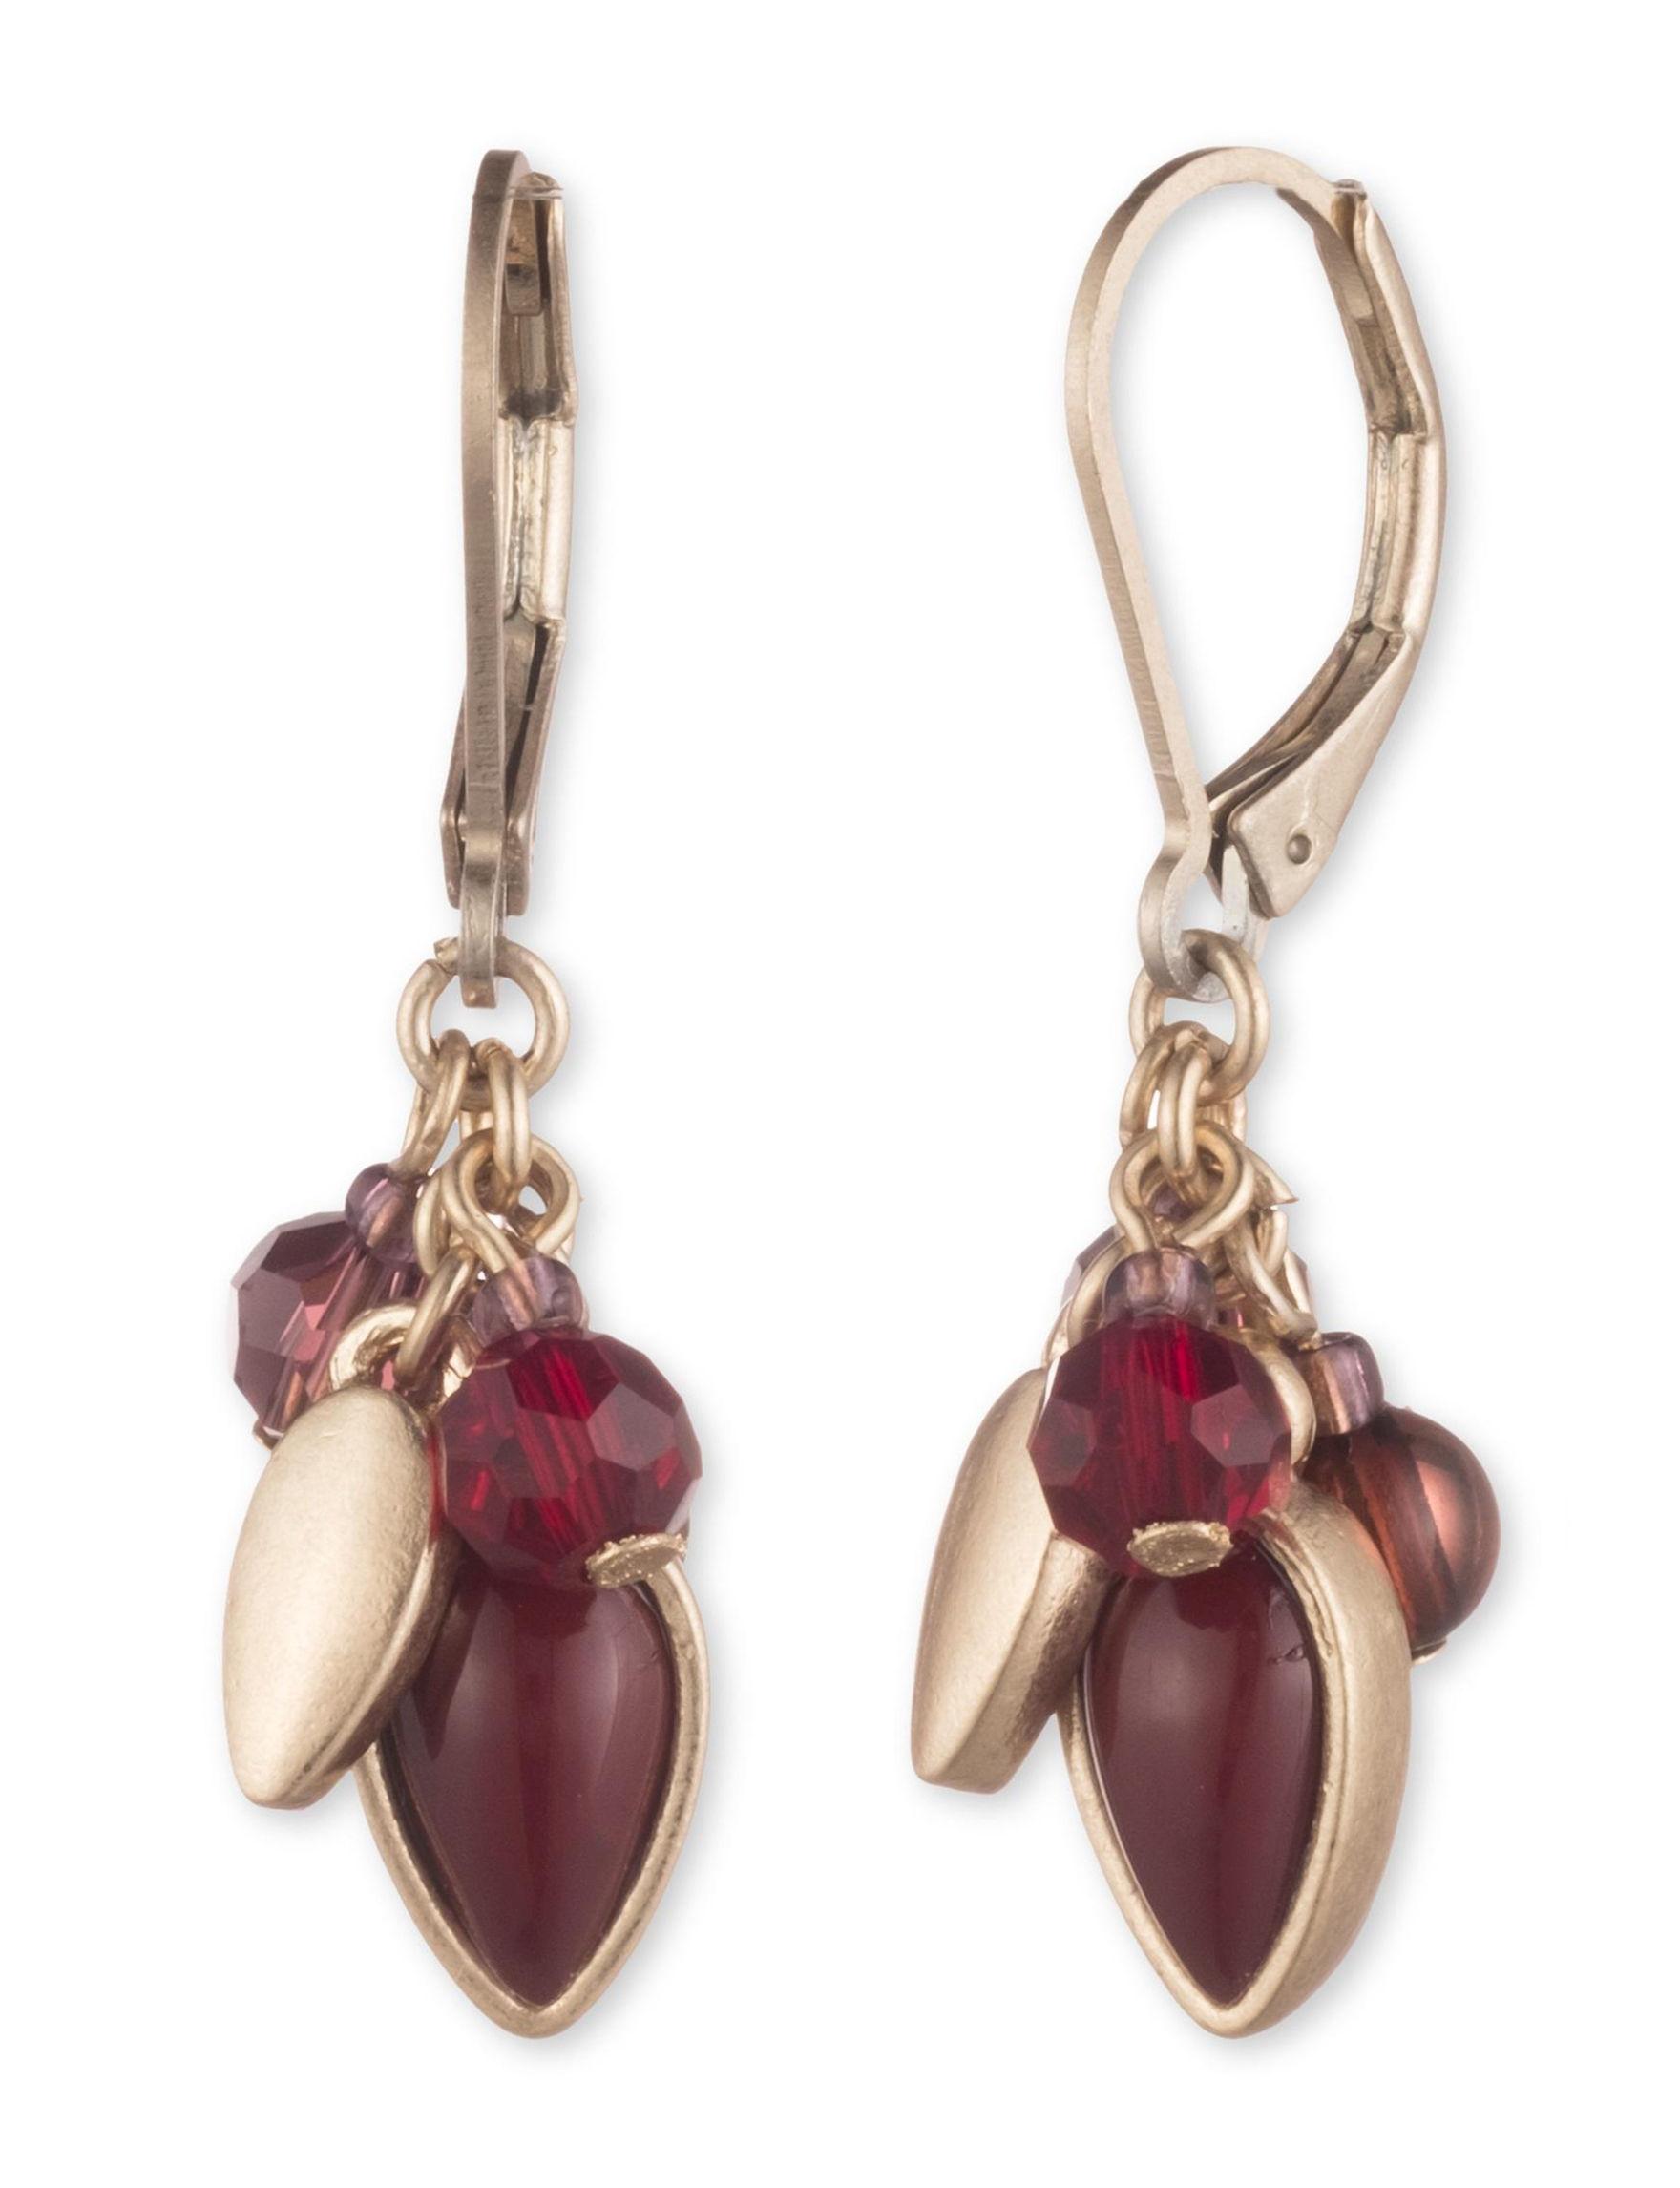 Chaps Burgundy/Gold Drops Earrings Fashion Jewelry